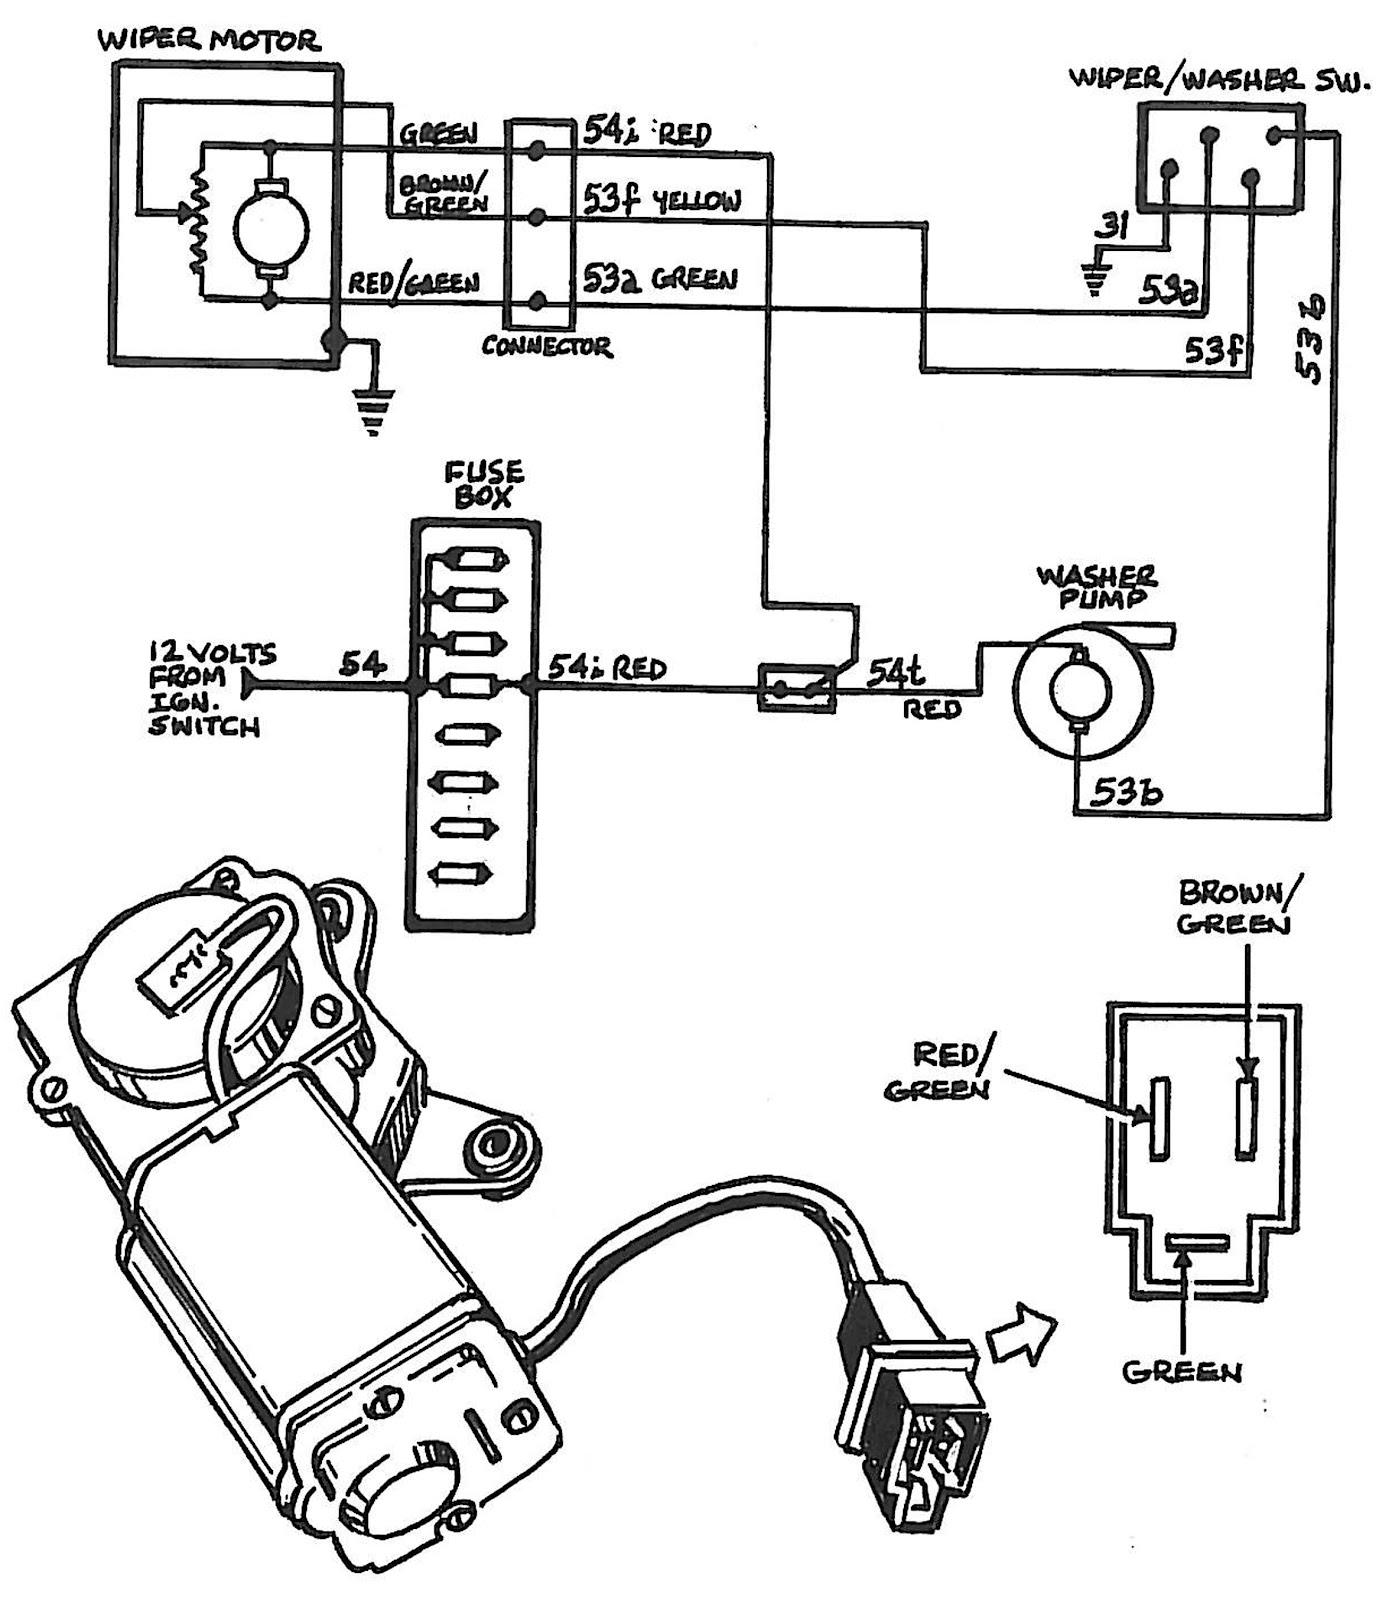 SAAB JOURNAL: EARLY WINDSHIELD WIPER MOTOR REBUILD